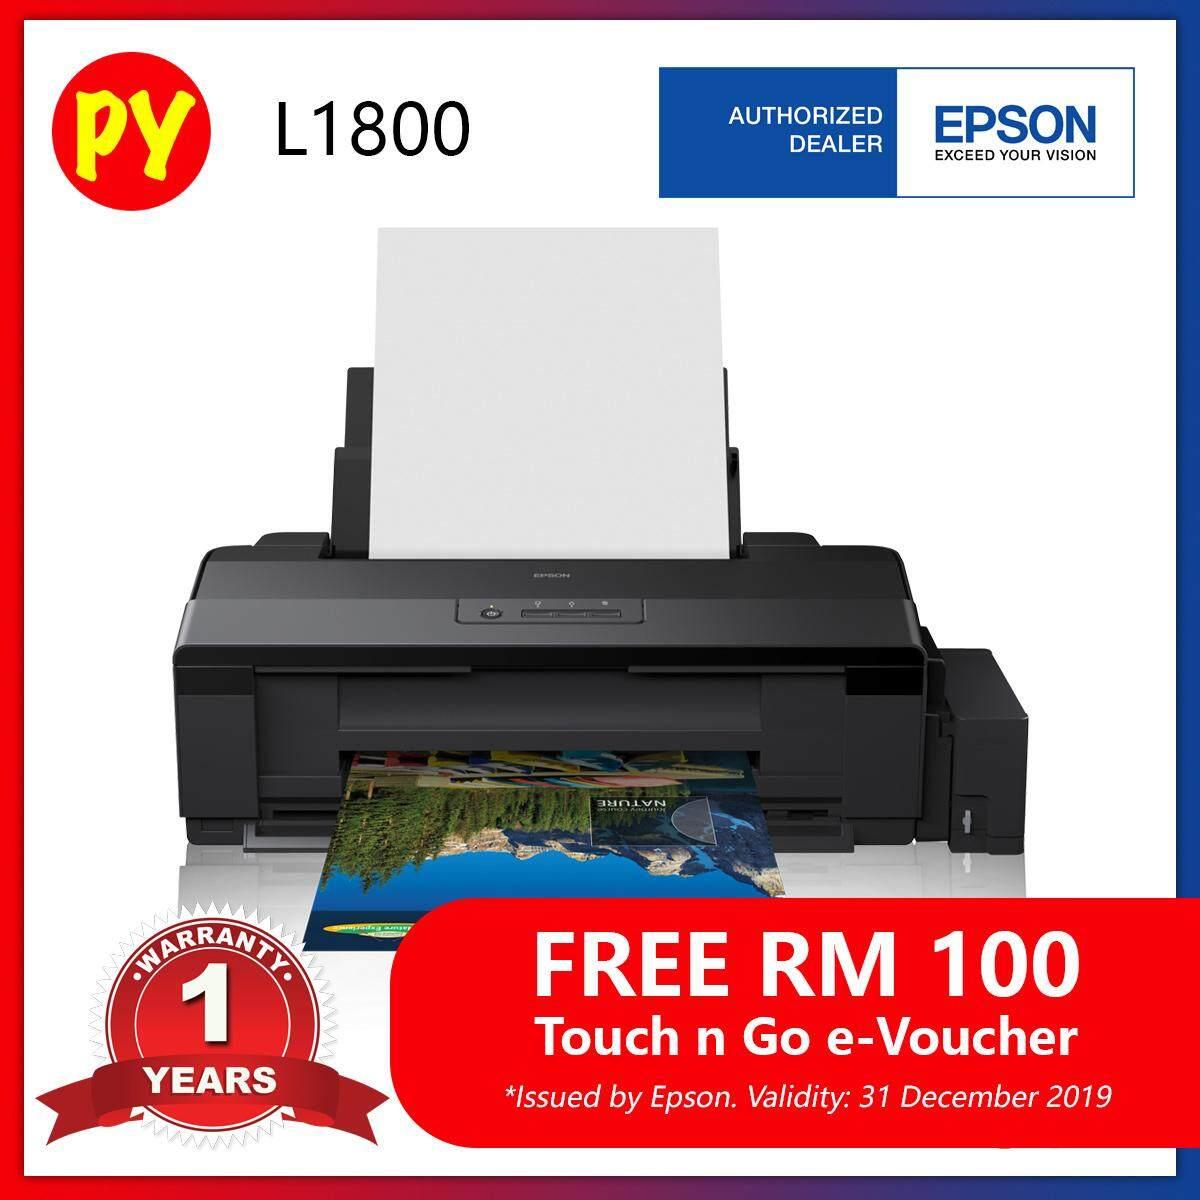 Epson L1800 A3 Photo Ink Tank Printer + Free RM100 Touch 'n Go E-Voucher